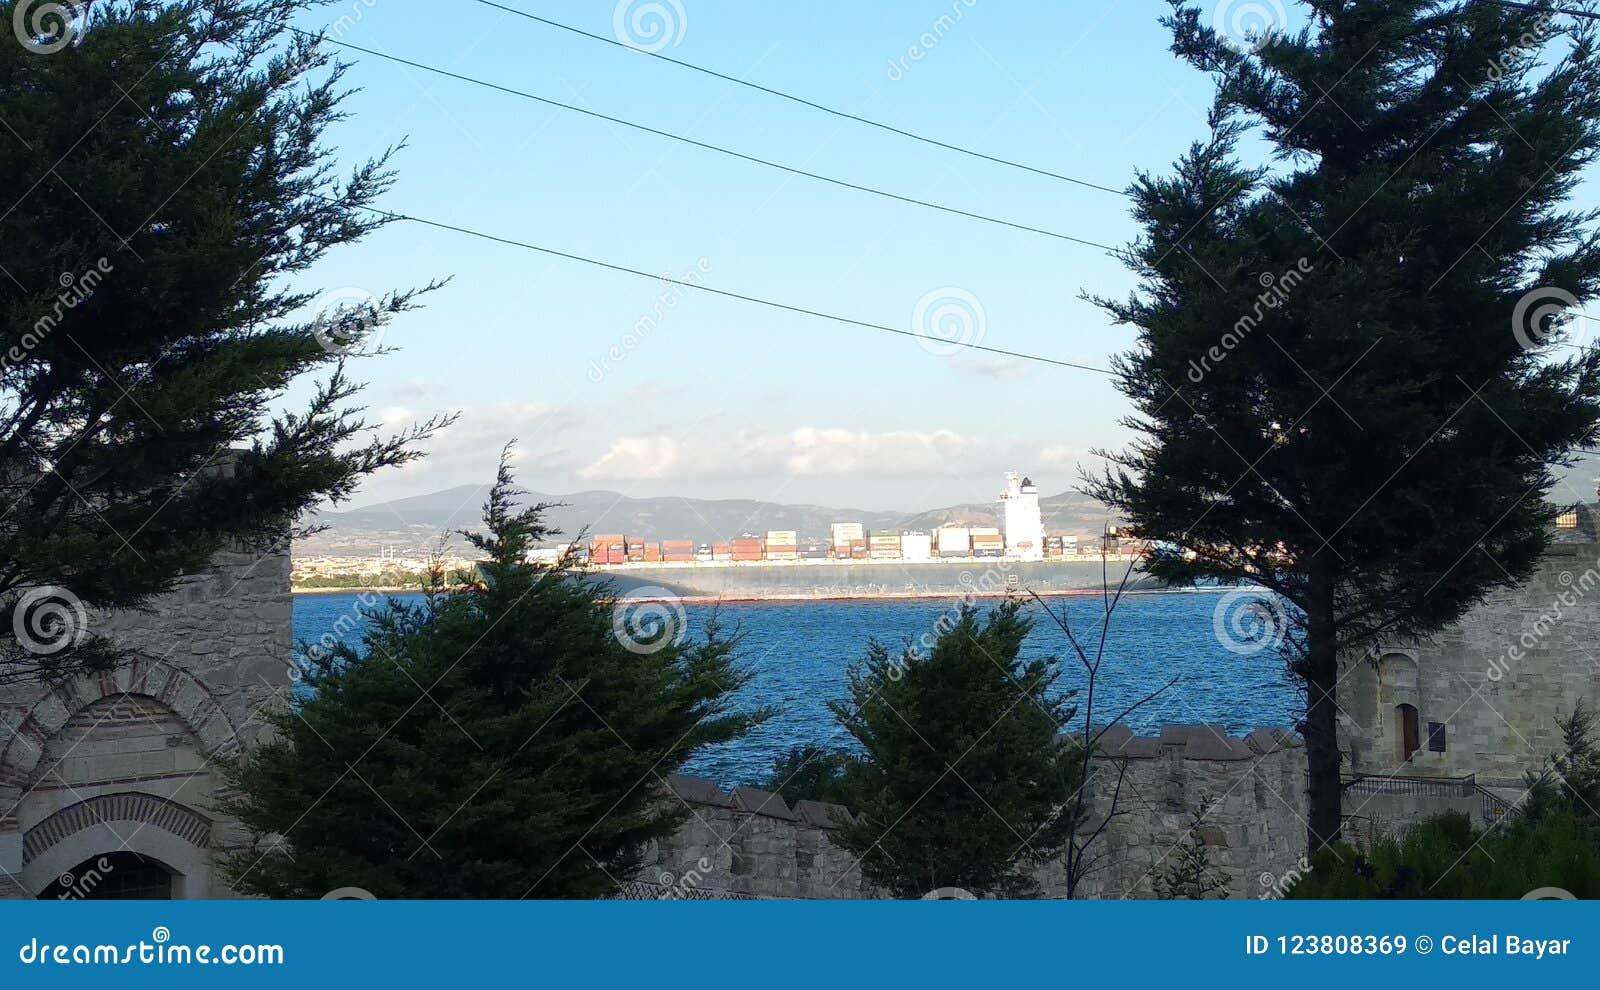 Download Canakkale Gallipoli stock image. Image of forest, giresun - 123808369